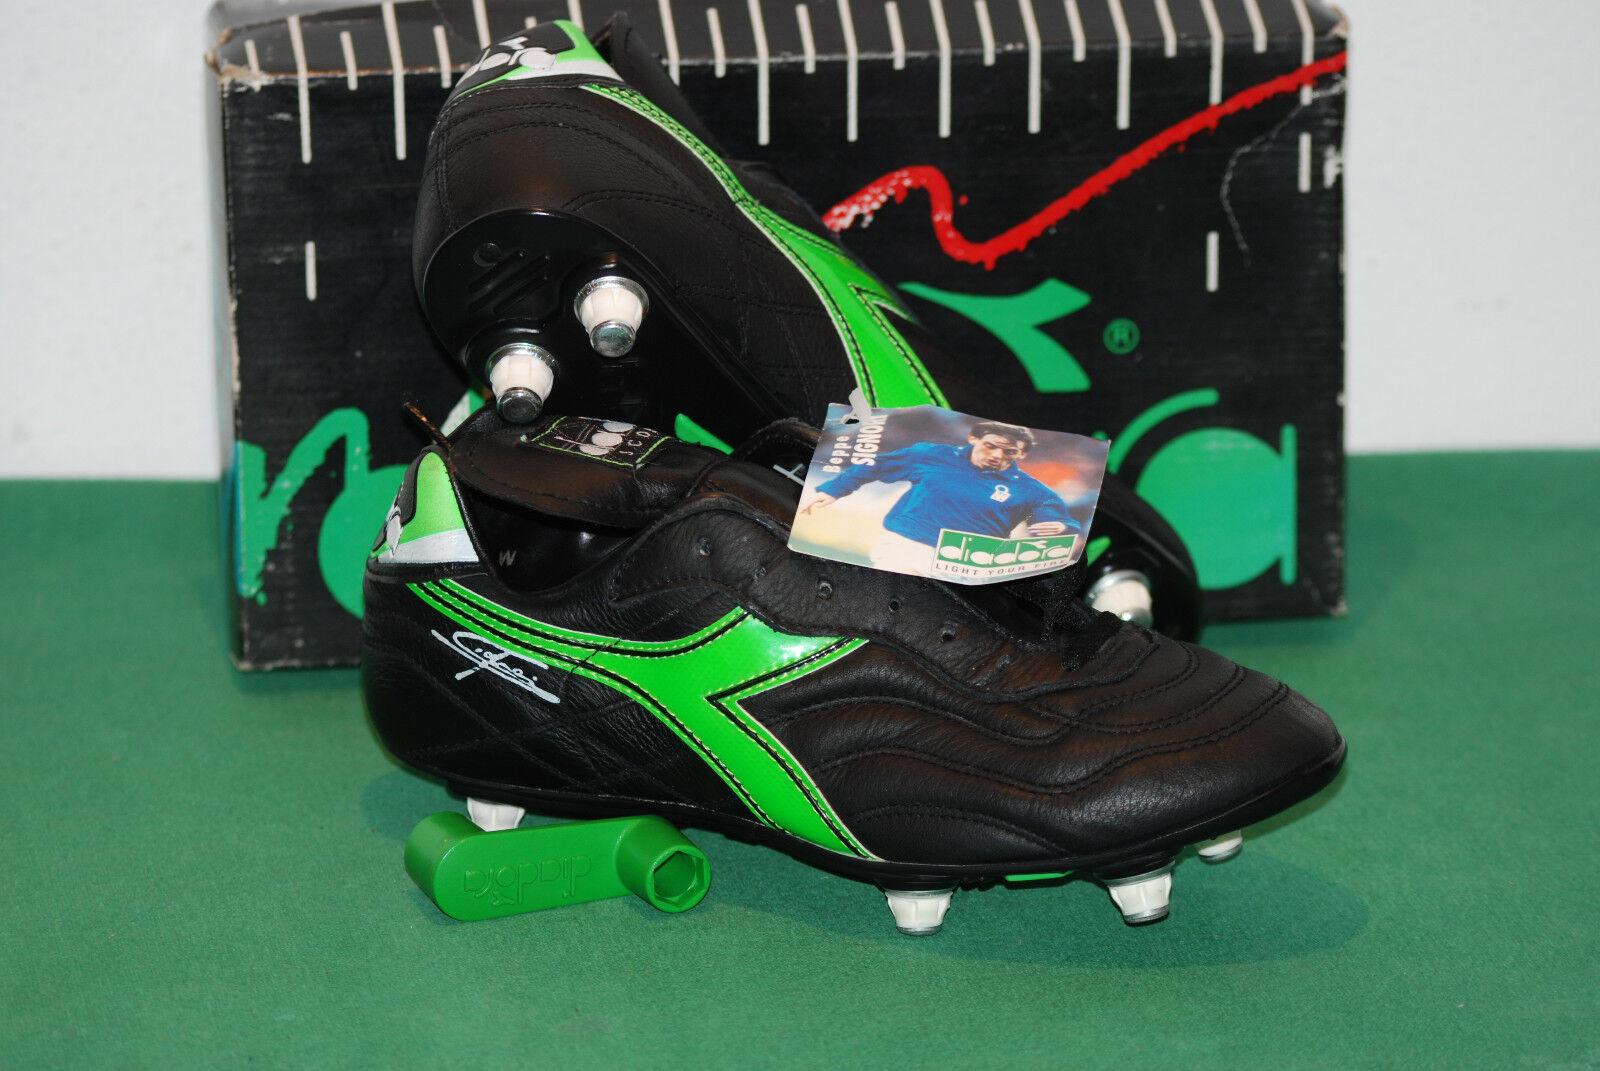 Vintage Diadora Beppe gentleHommes Scorer SC Football bottes UK 7.5 Double Action 90